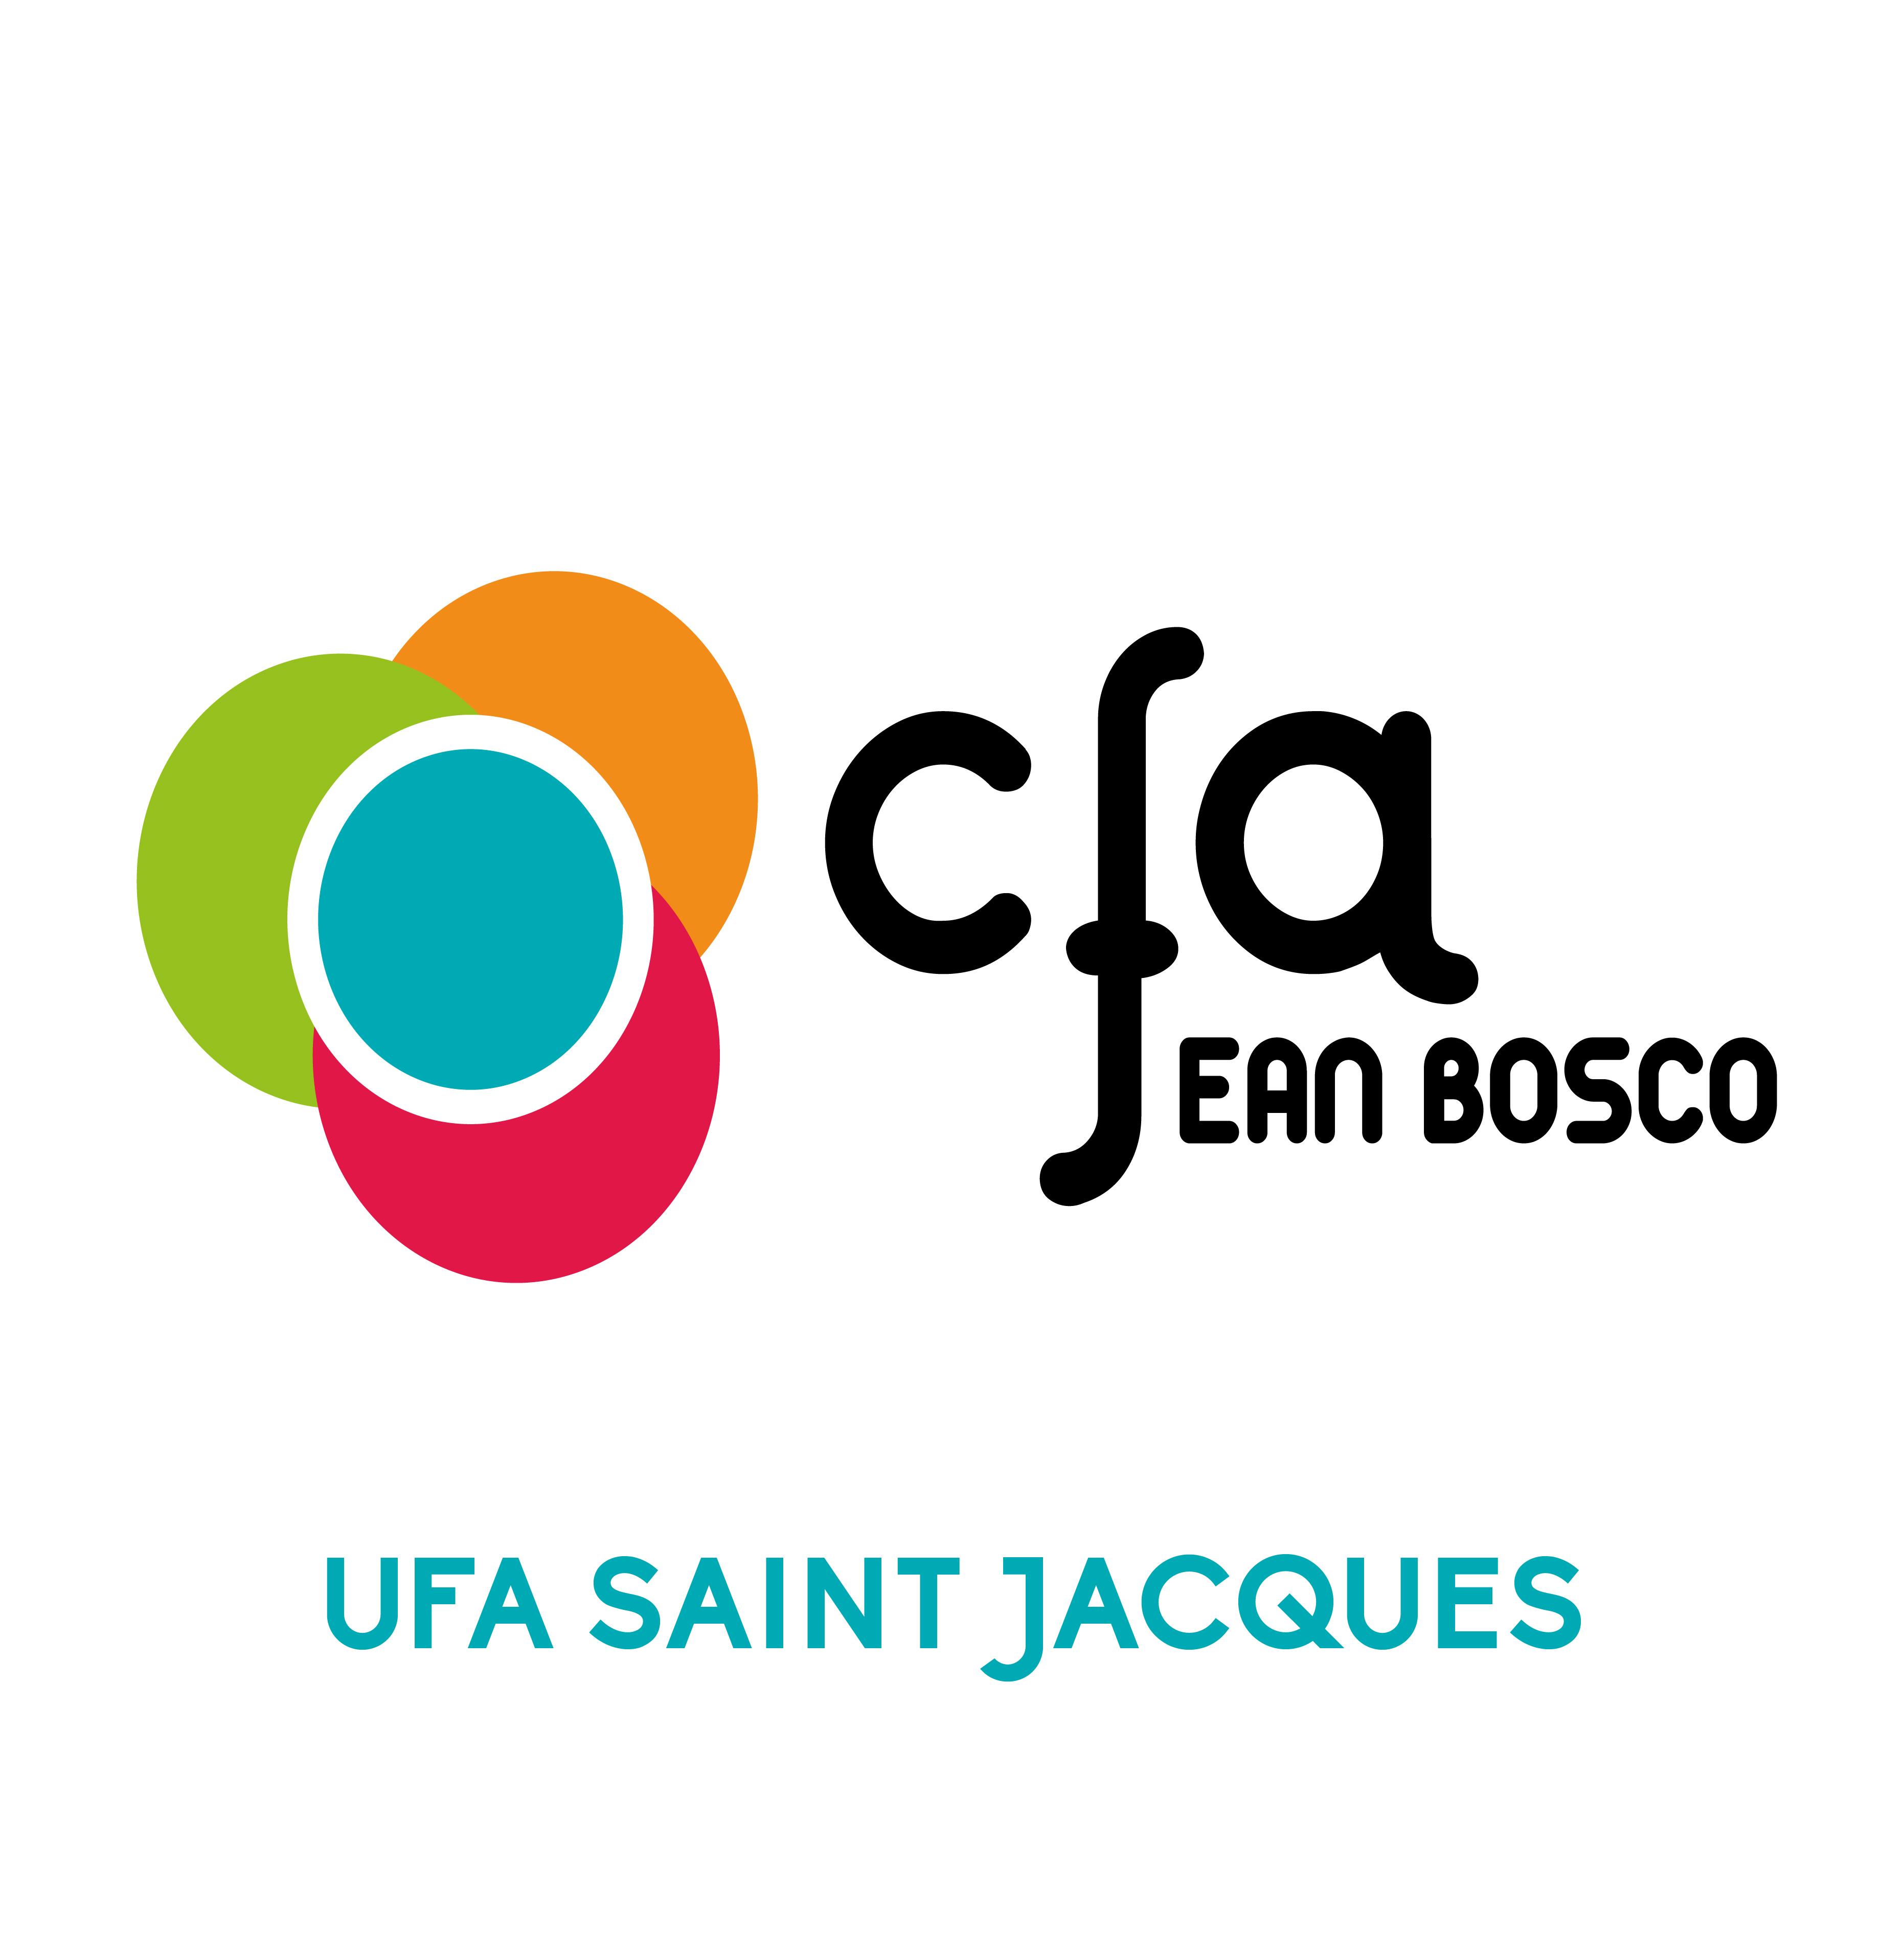 LOGO CFA-SAINT-JACQUES